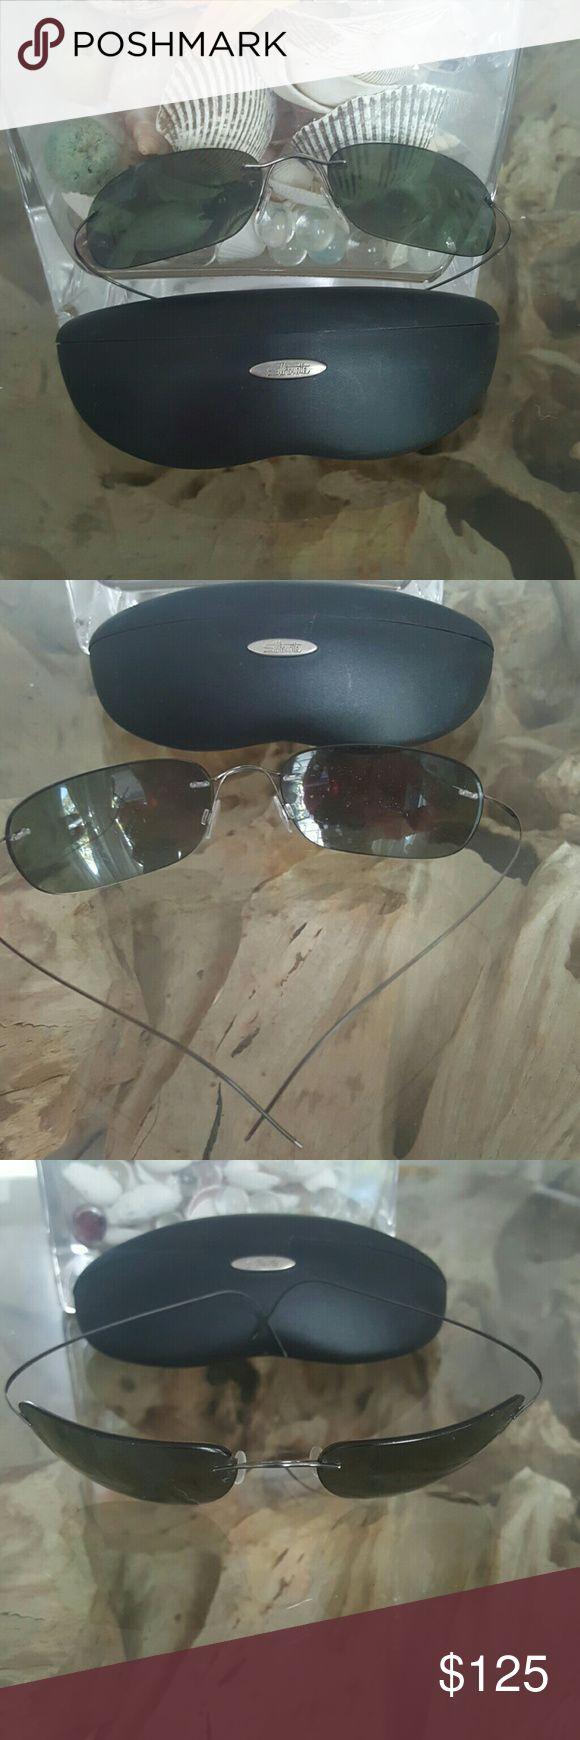 Silhouette Sunglasses ultra thin lightweight sunglasses with case silhouette  Accessories Sunglasses